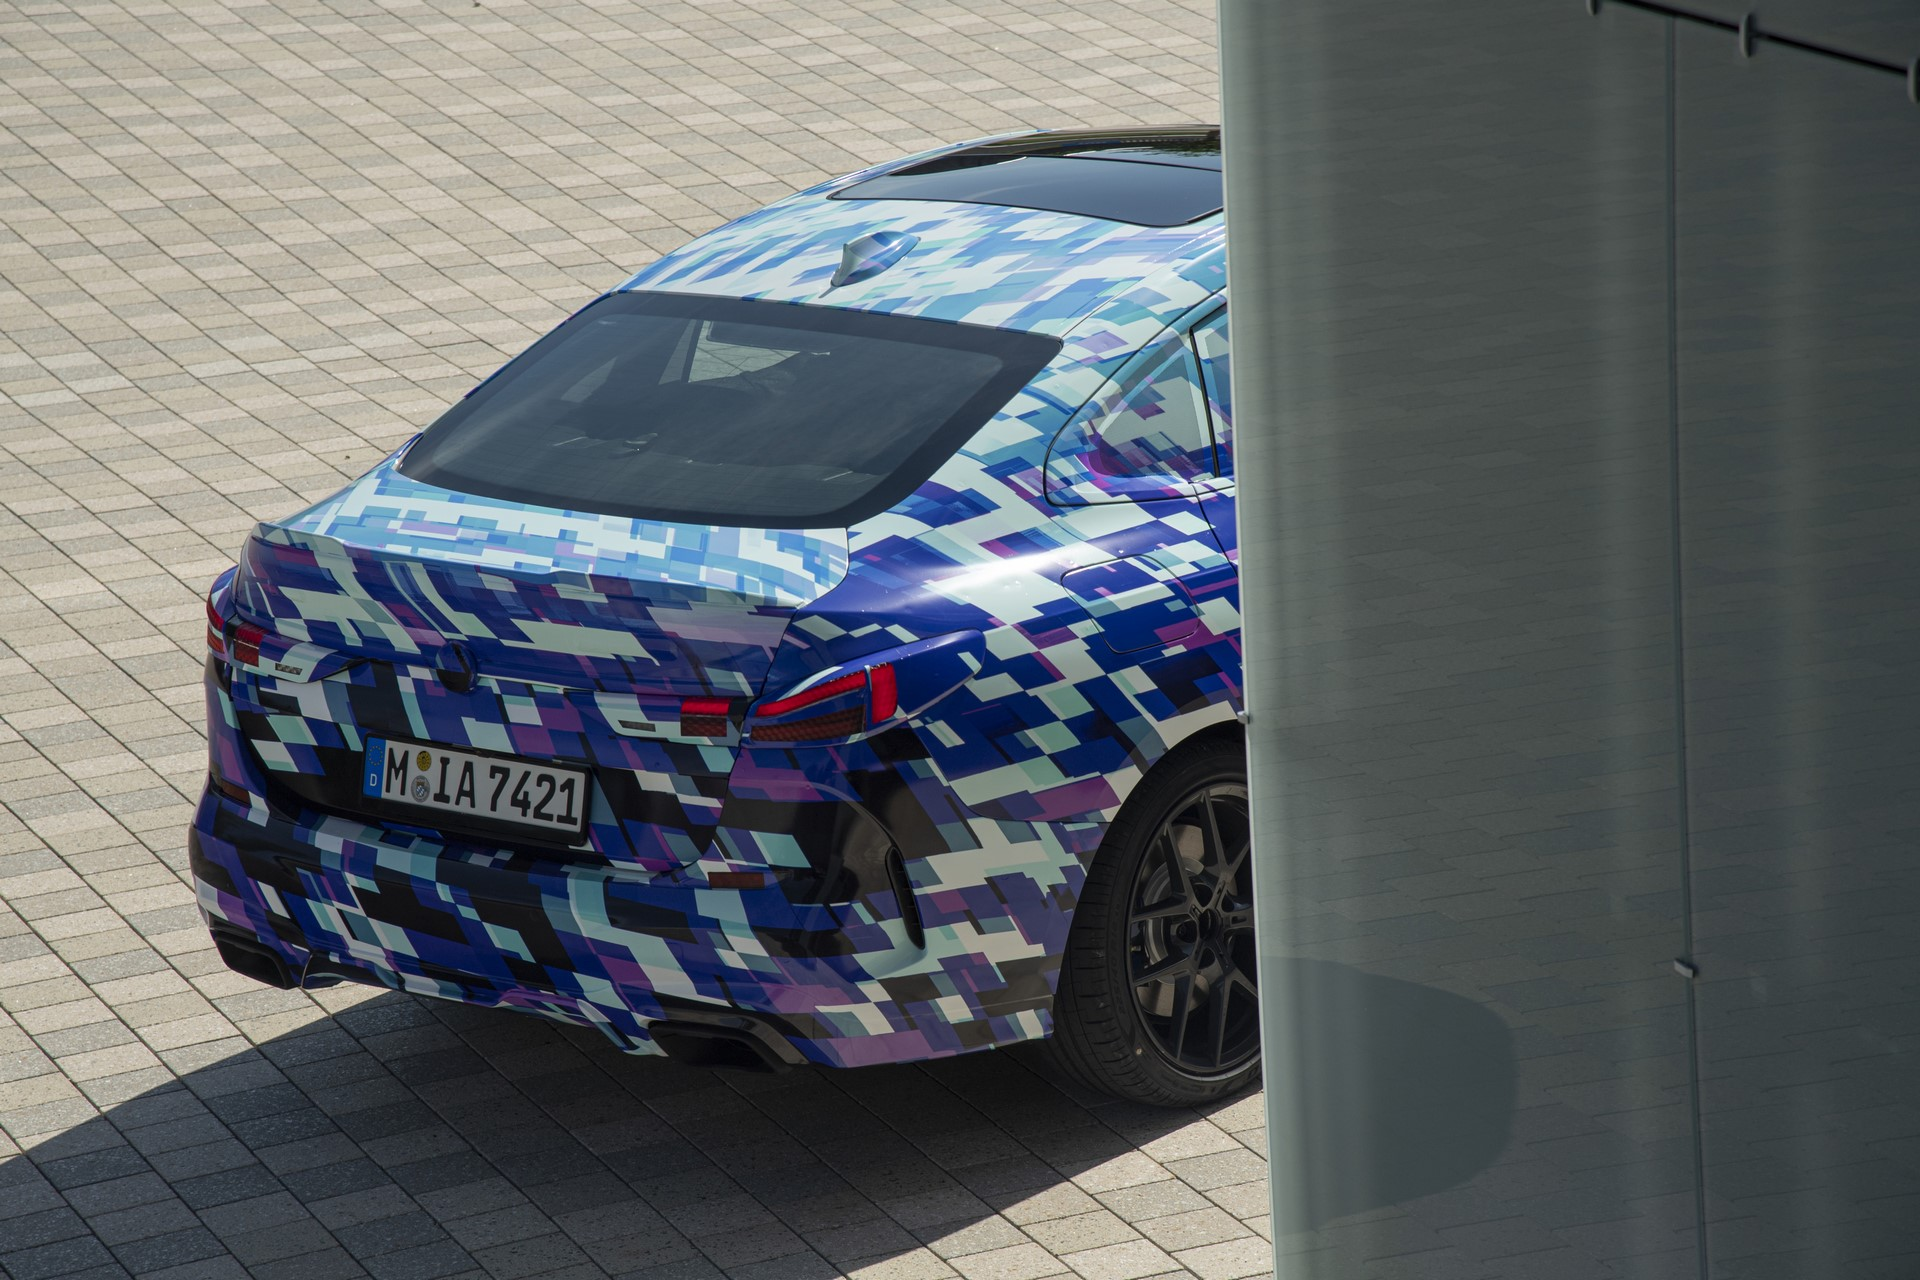 BMW-2-Series-Gran-Coupe-2020-spy-photos-23